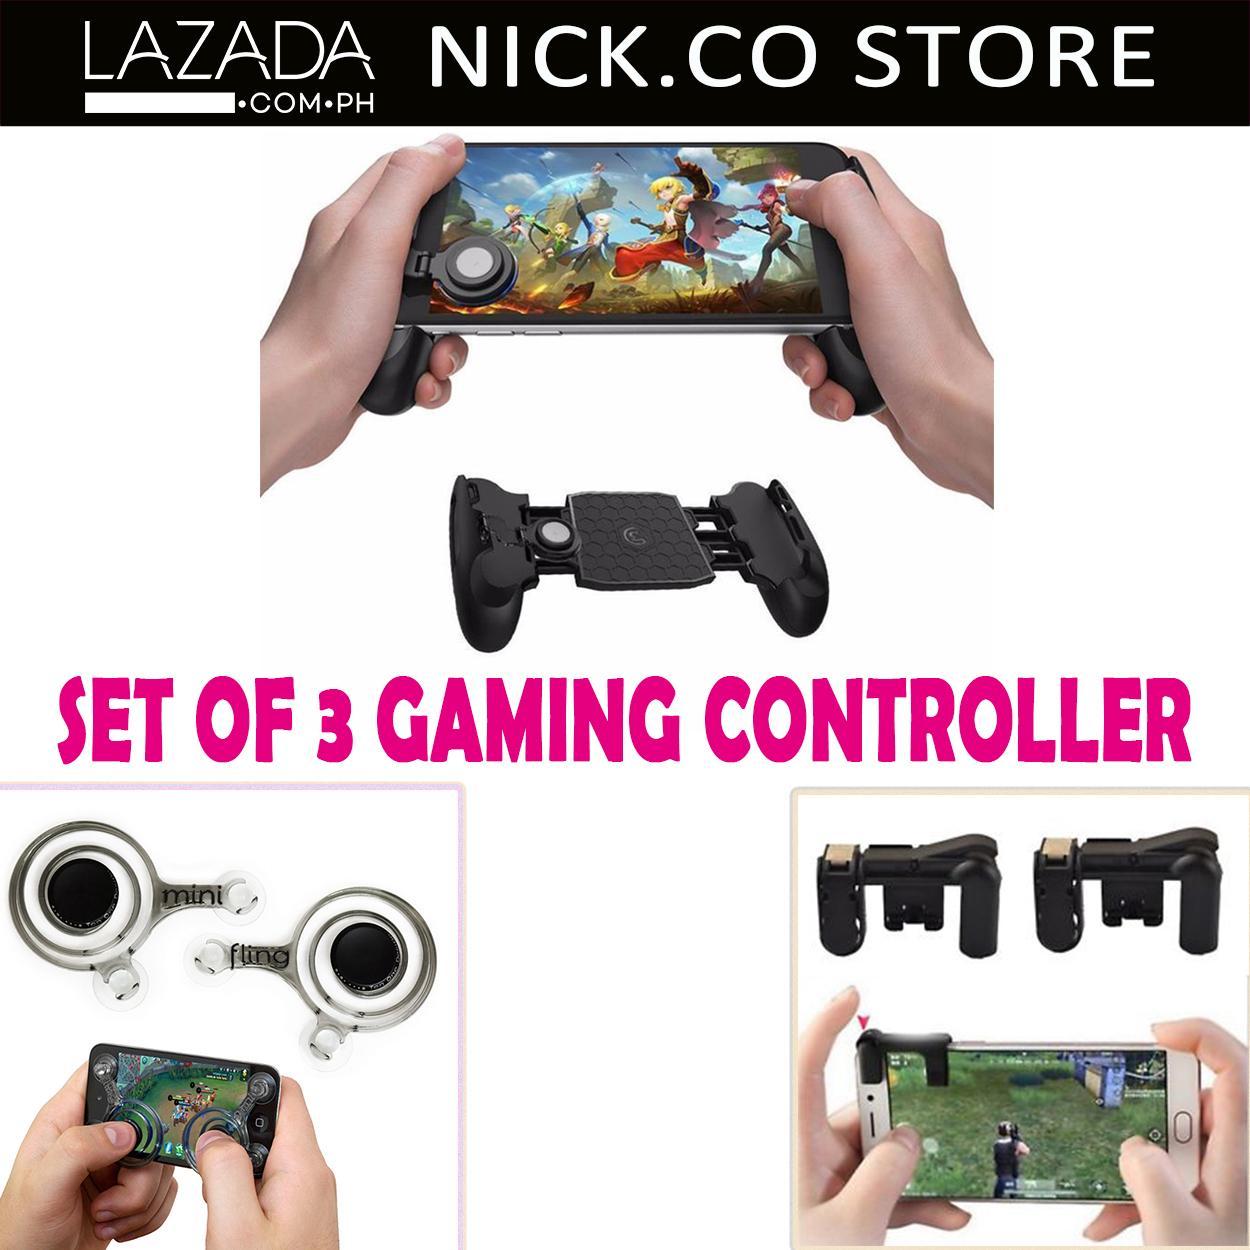 Set Of 3 Mobile Gamepad Fling Mini Joystick Gaming L1R1 Sharpshooter Controller Gaming Mobile JL-